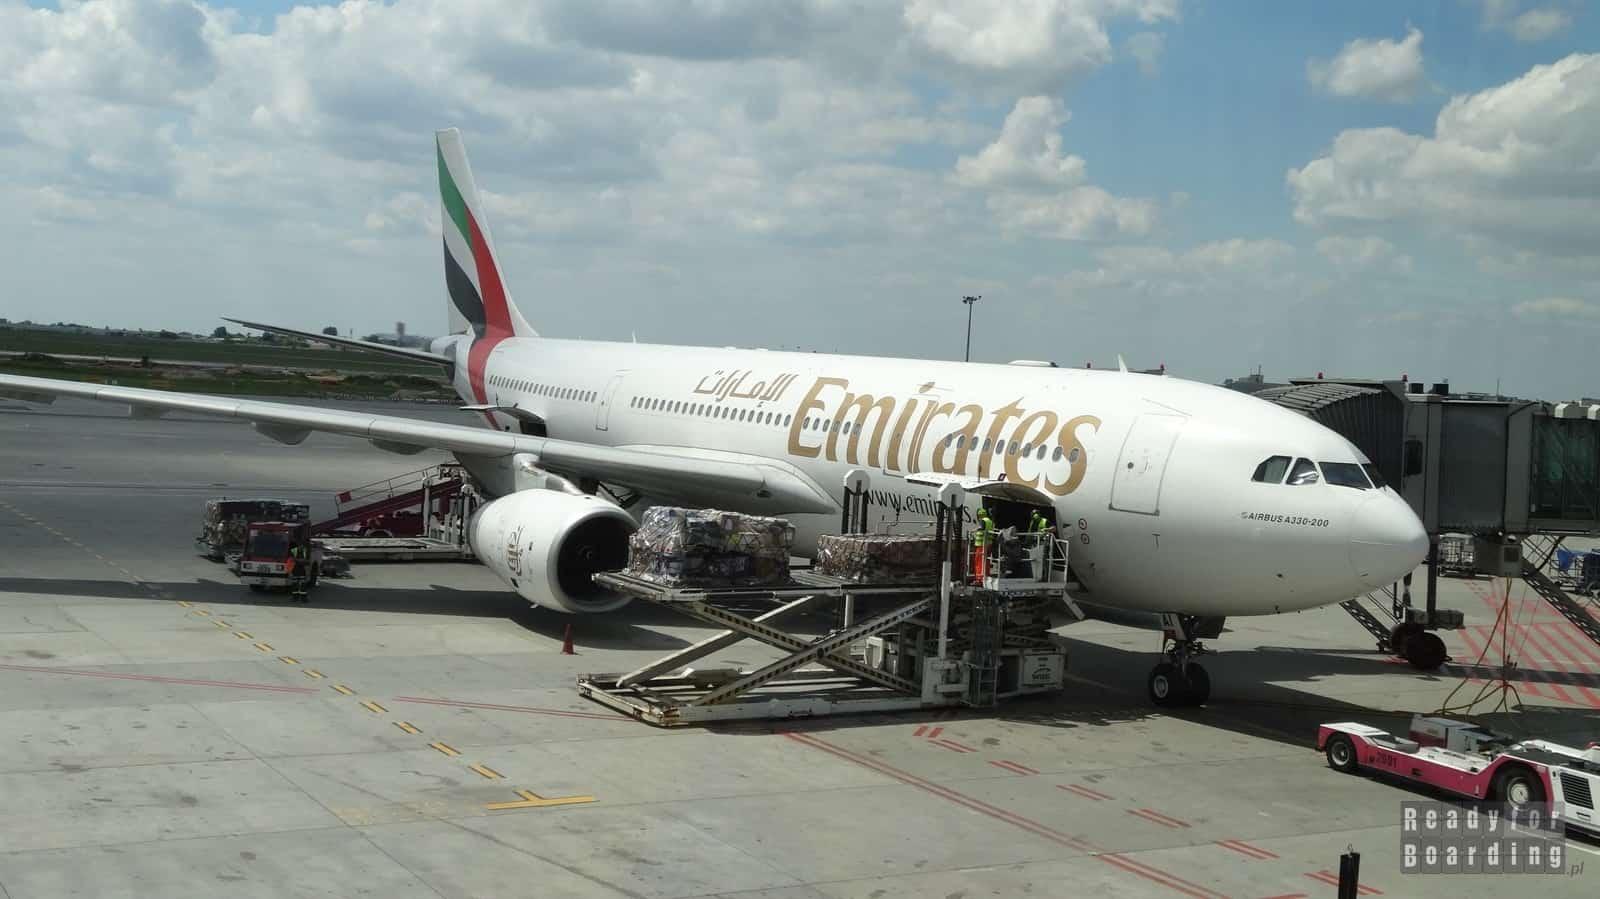 Samolot Emirates na trasie Warszawa Dubaj